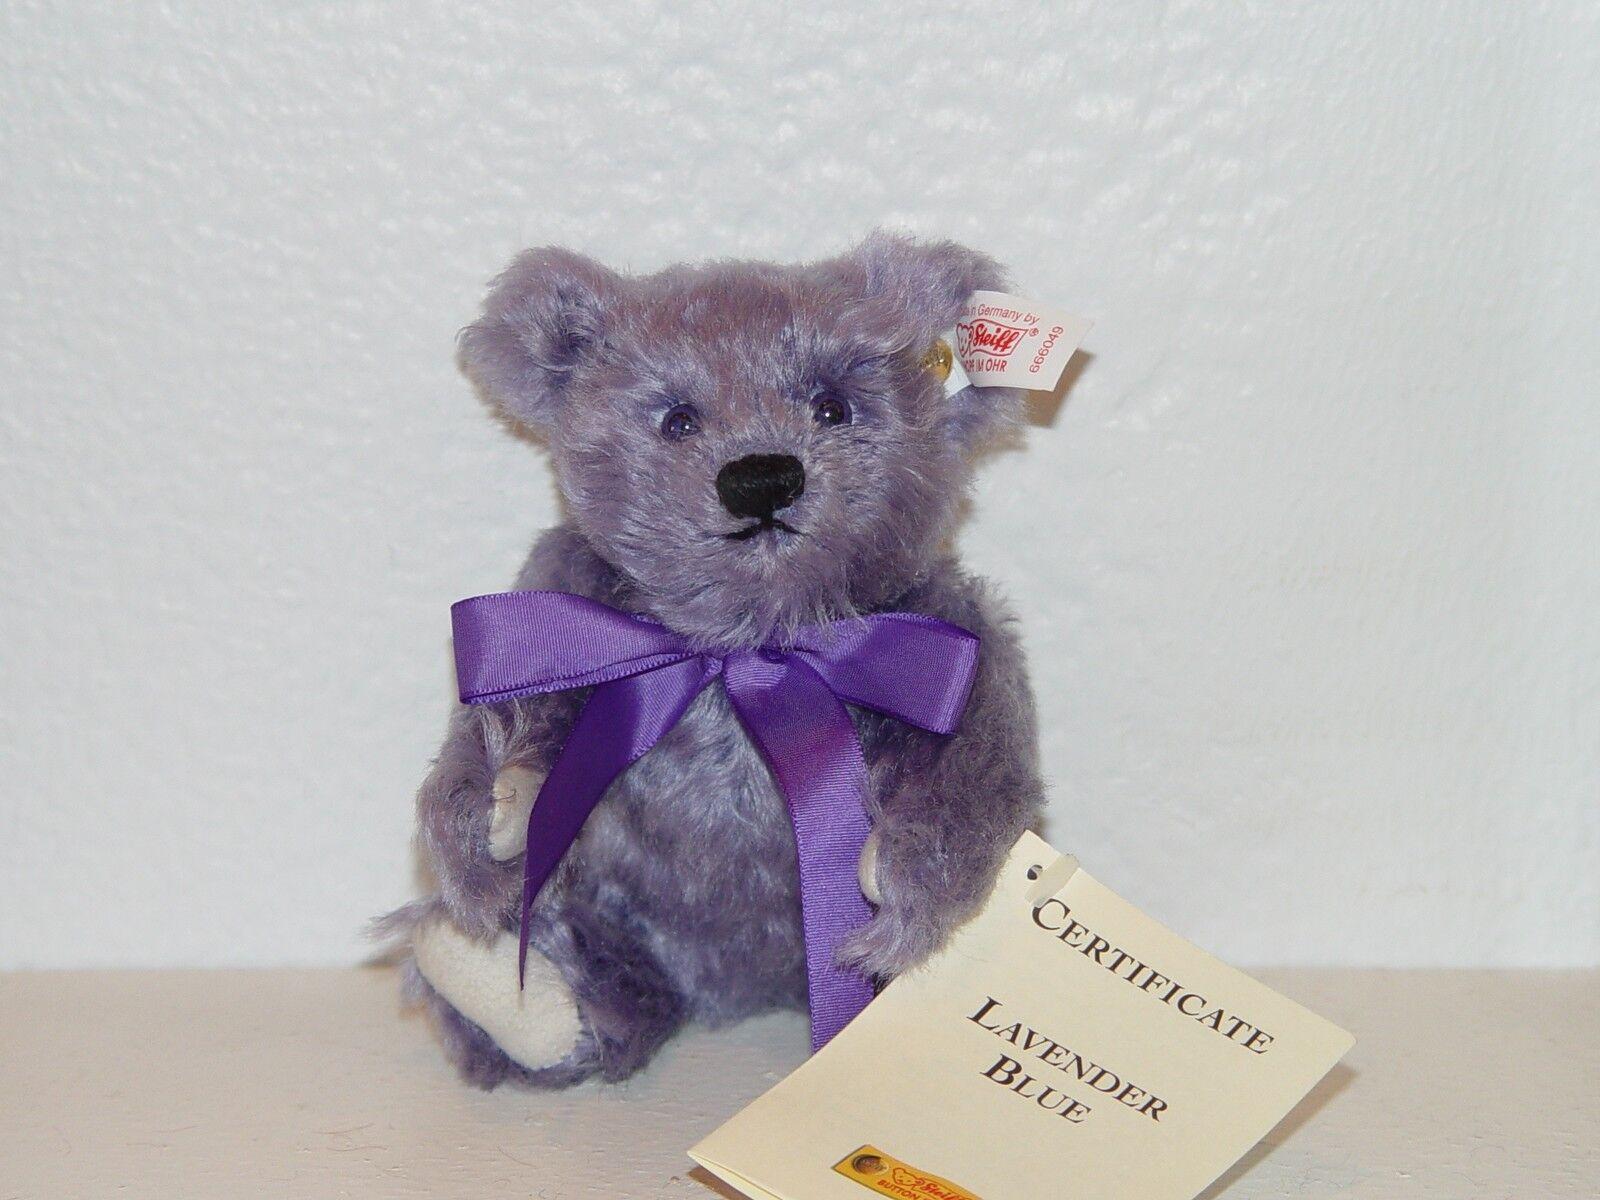 Steiff MINI LAVENDER blu Teddy Bear EAN 666049 MOHAIR 6.29 inches  16cm  - NEW